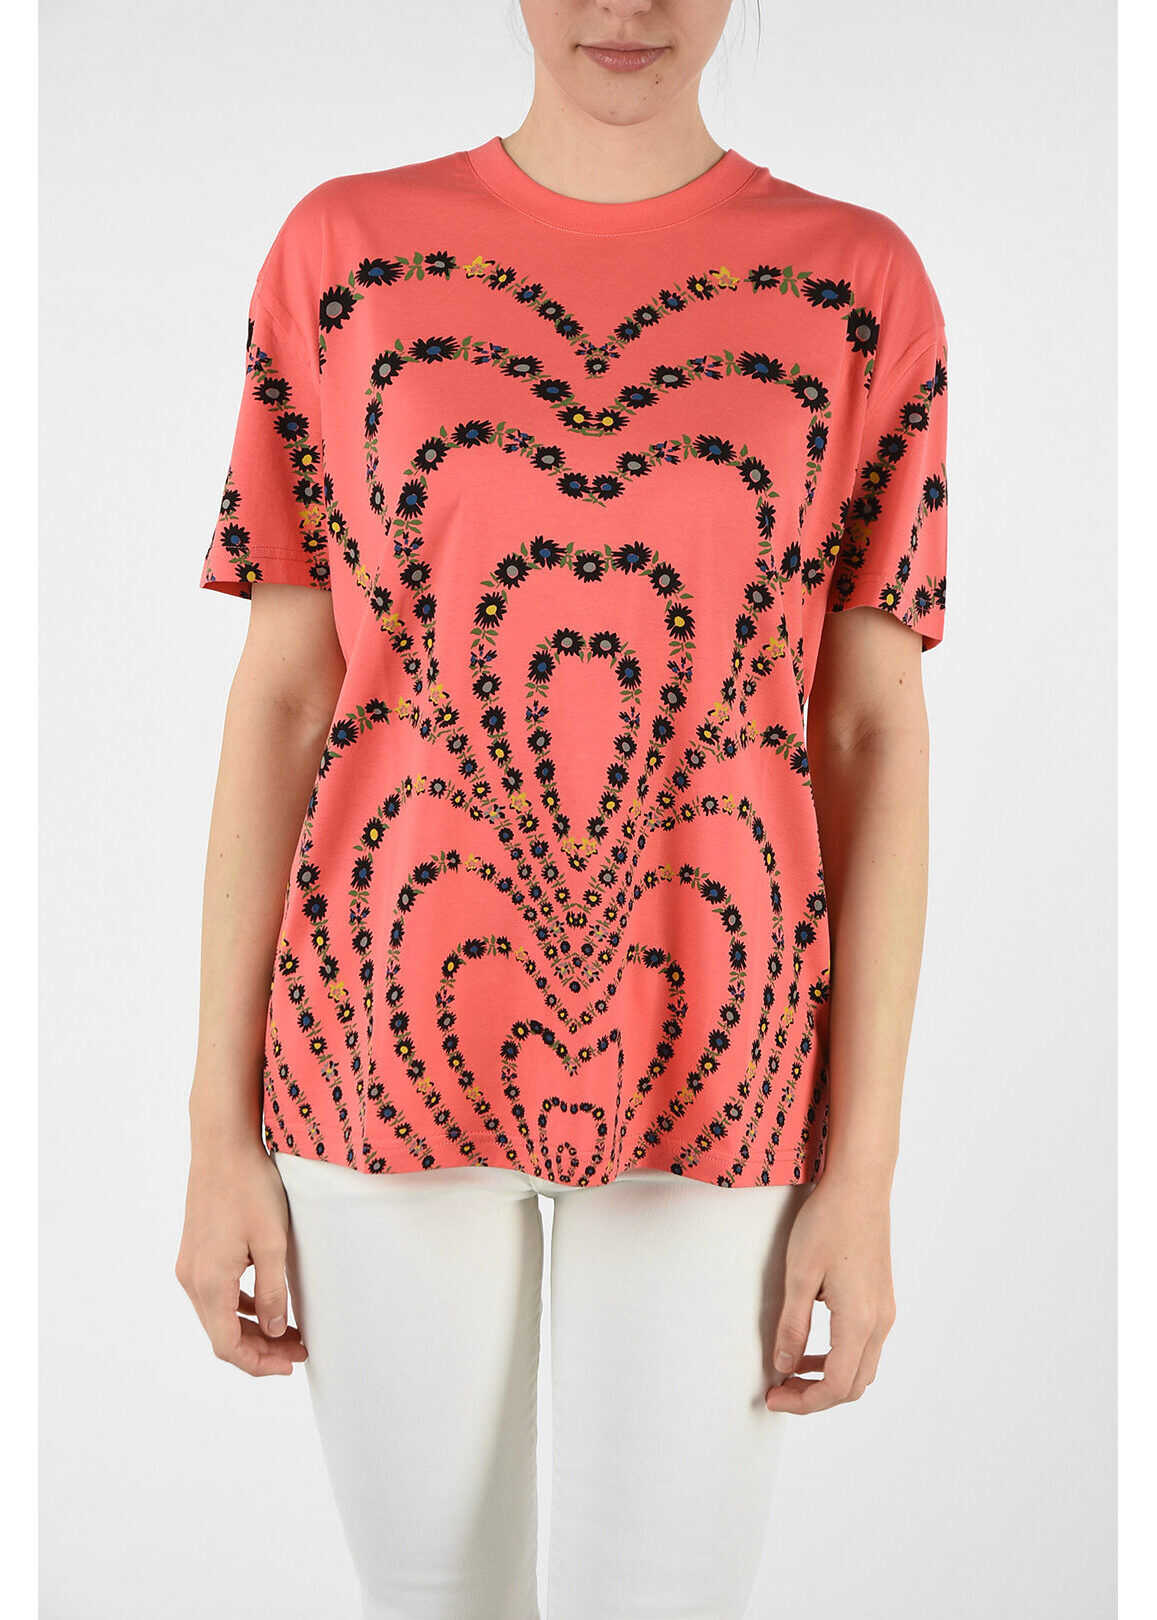 Givenchy floral-print t-shirt PINK